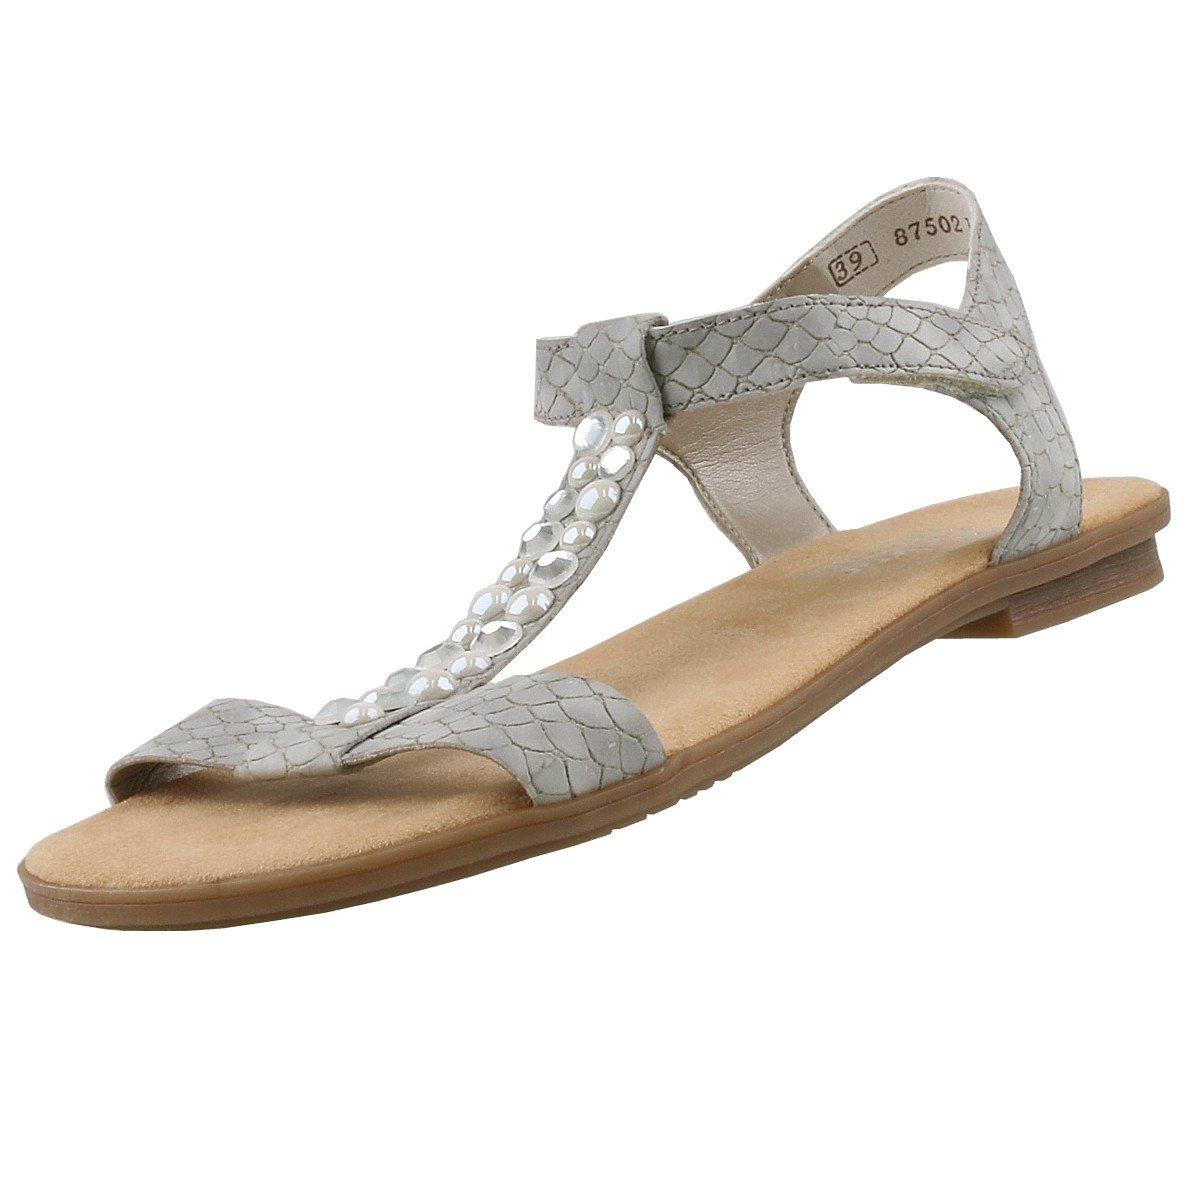 Rieker 64299 Sandale - Sandale Salome - B00CAL9Y8G Salome Gris Clair Gris 91ba064 - therethere.space